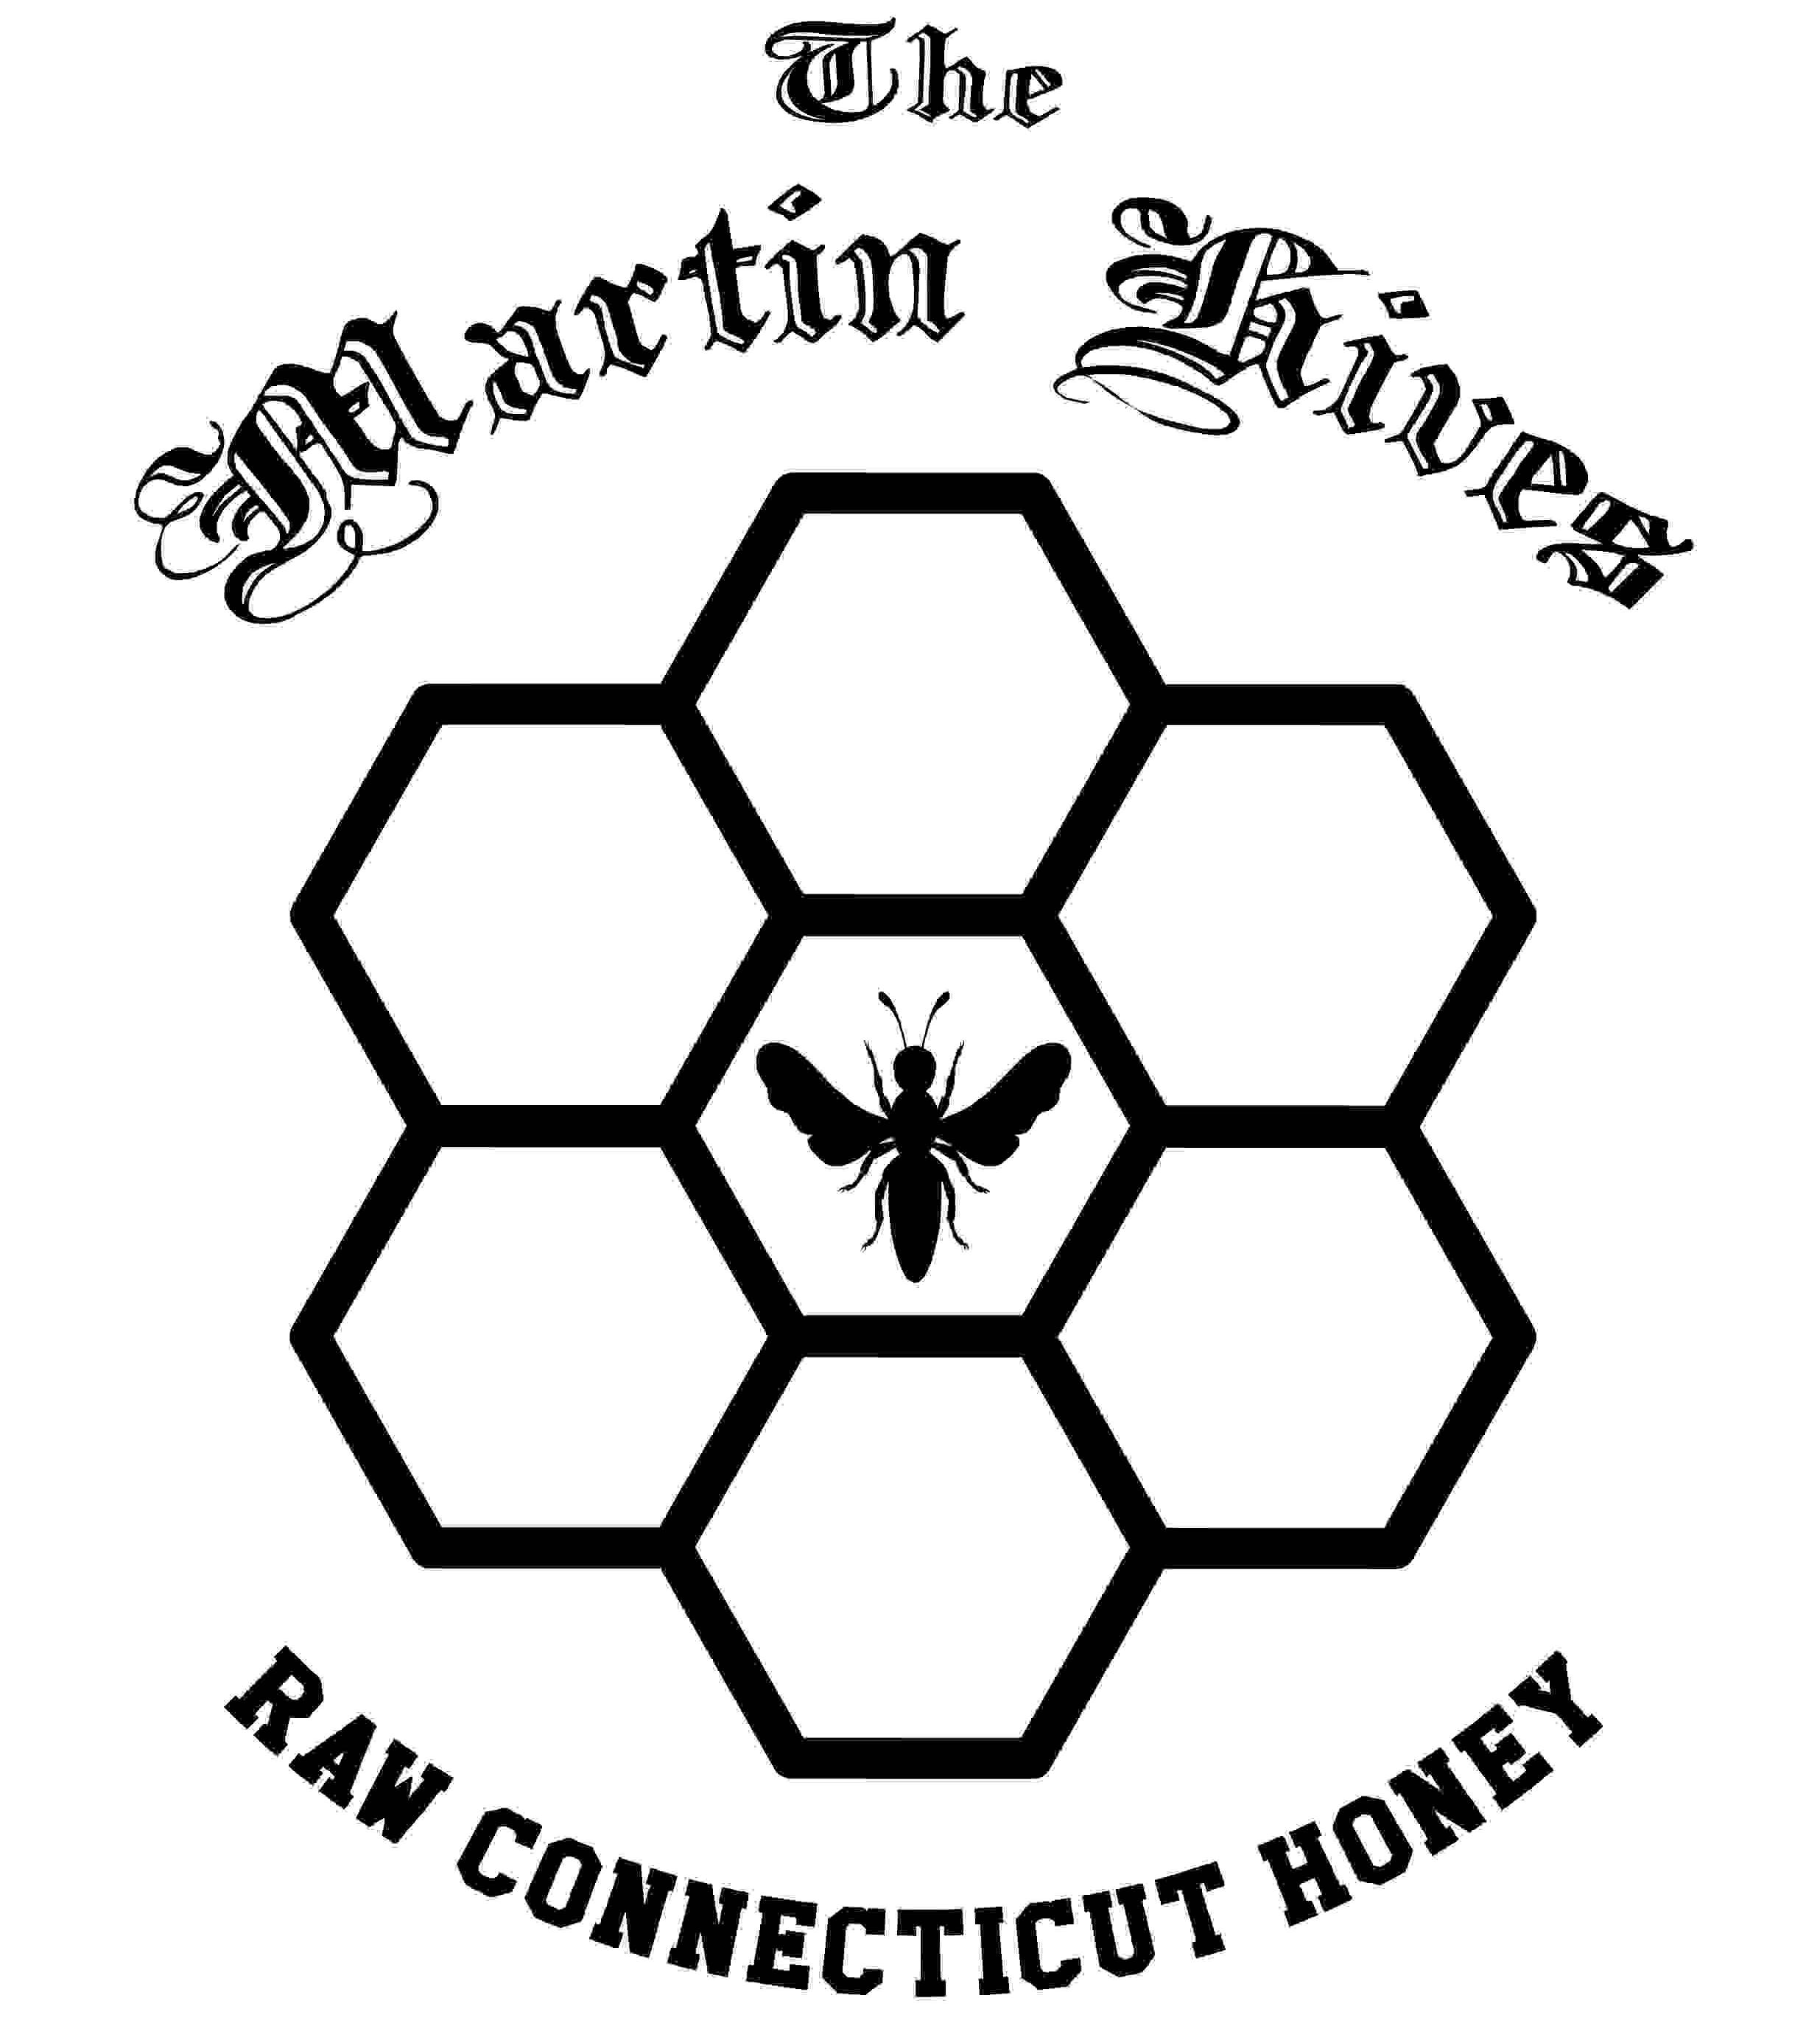 The Martin Hives